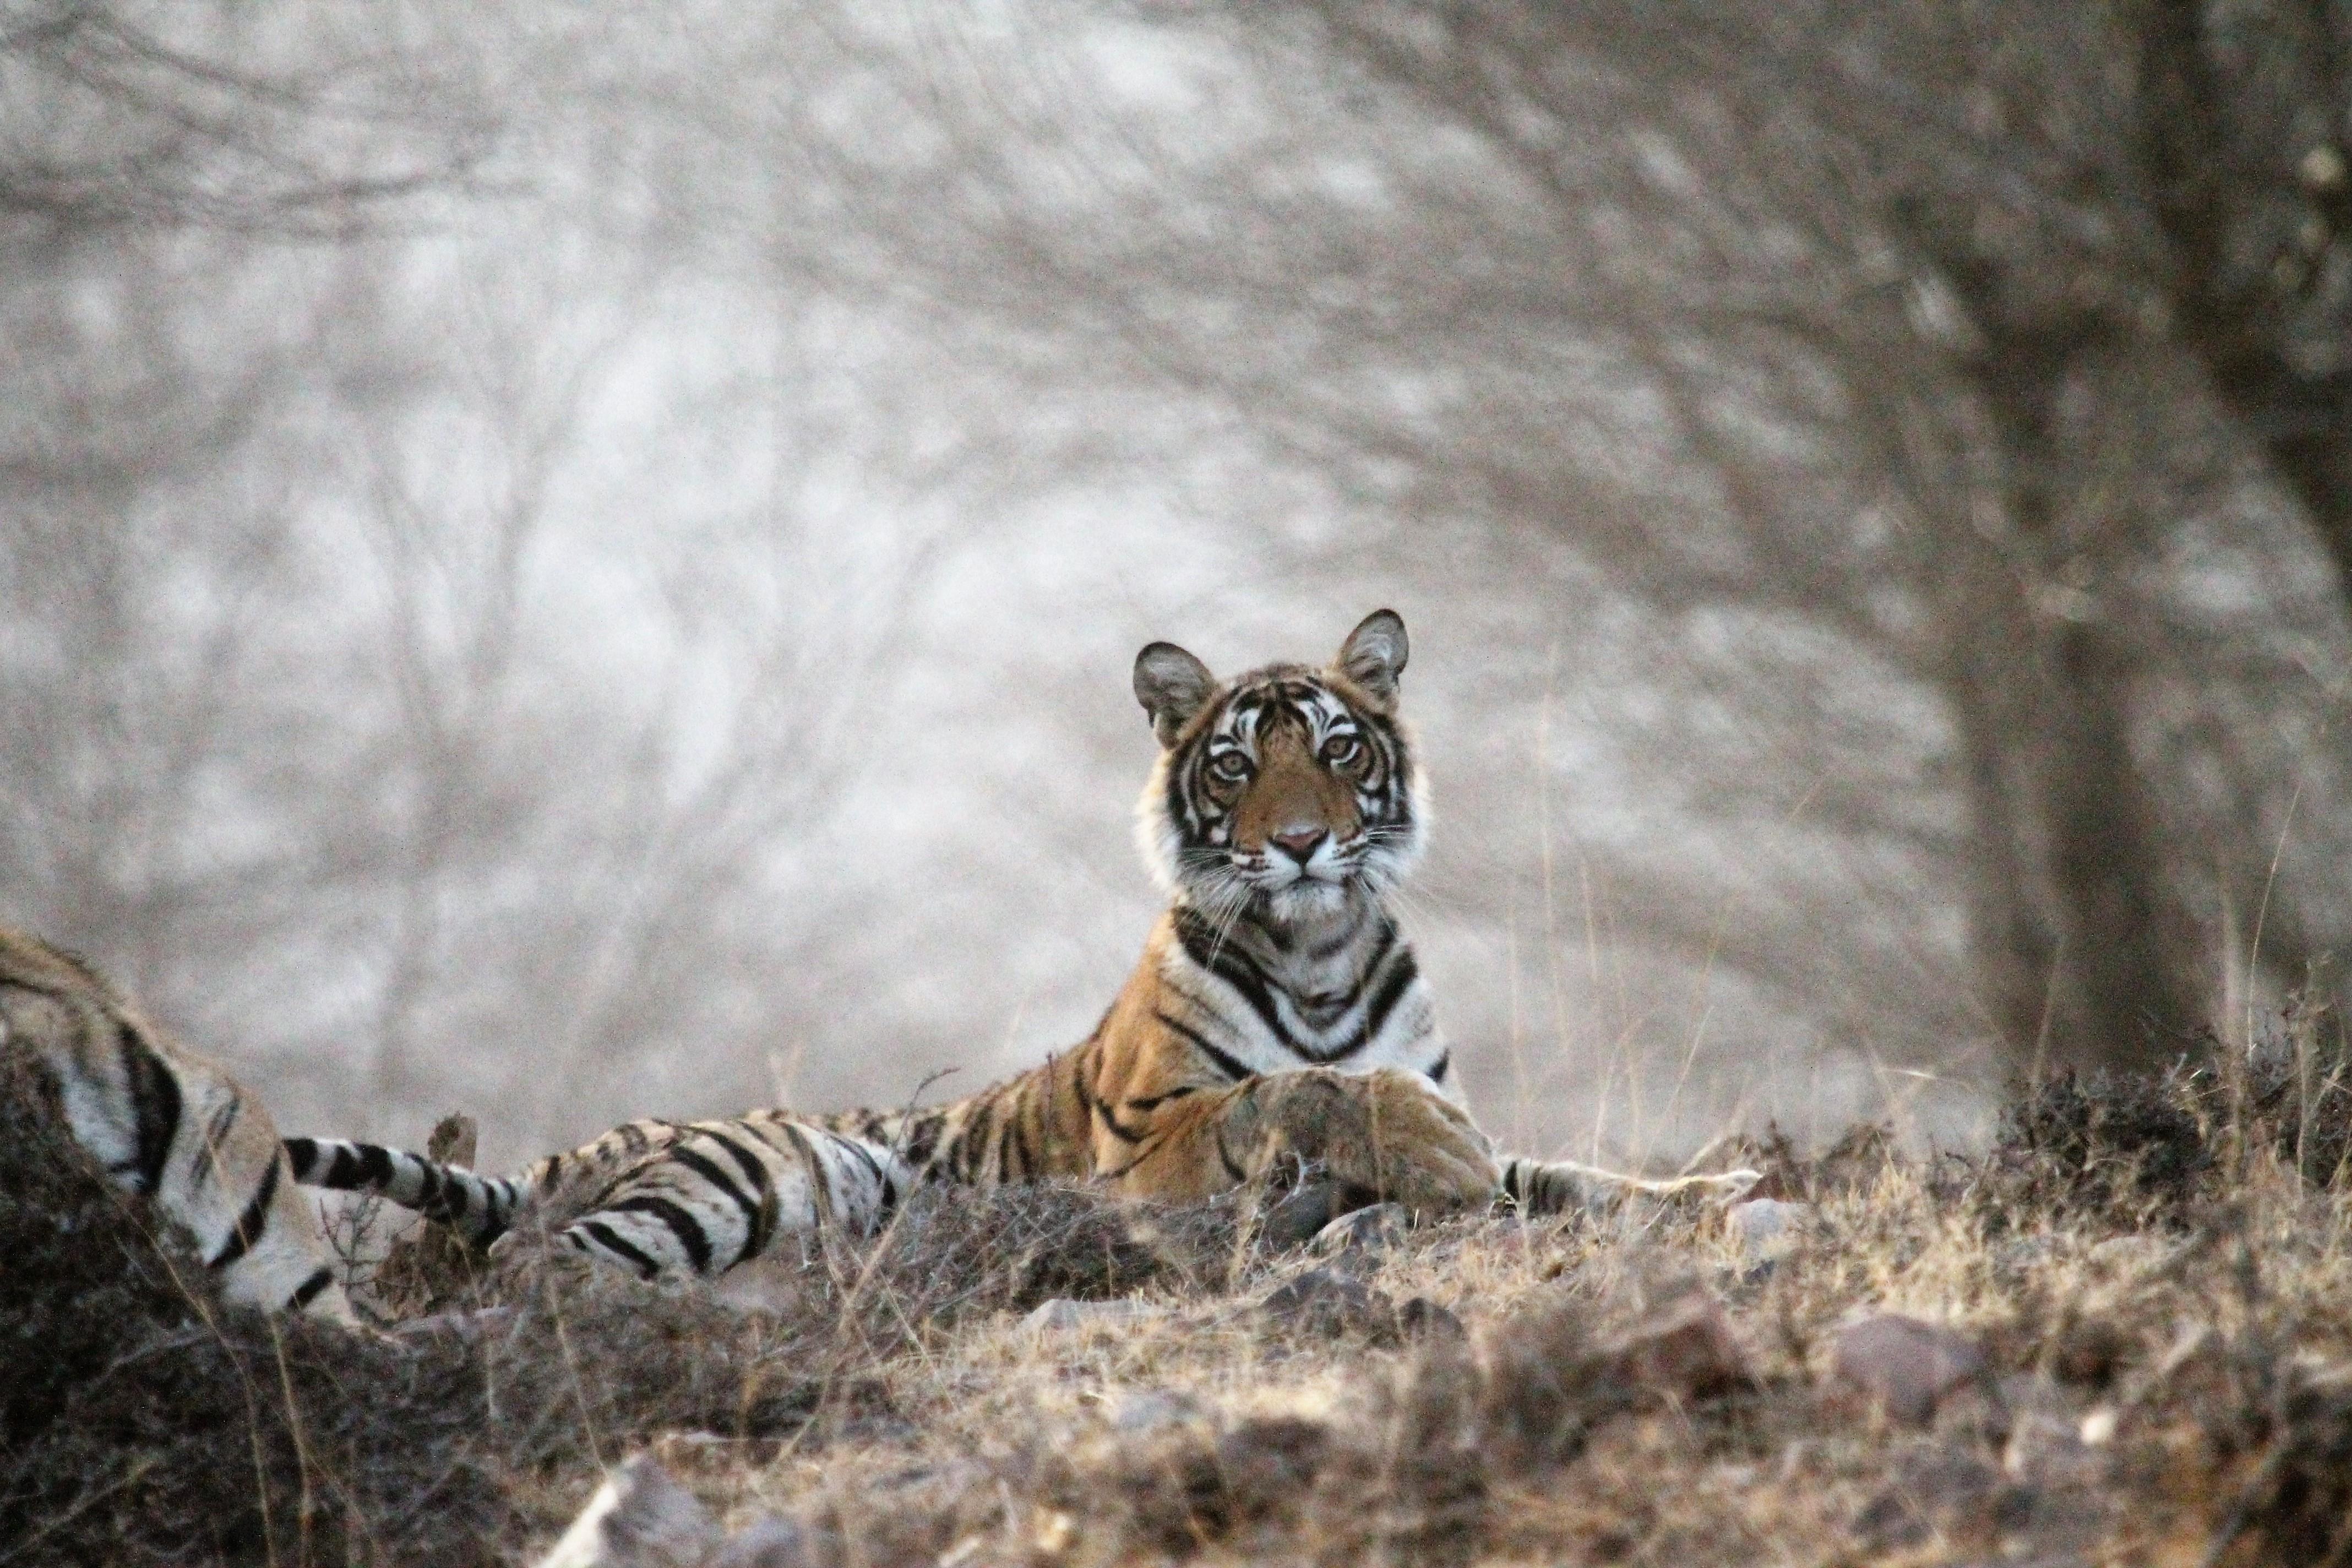 Tiger Safari Ranthambore National Park, Rajasthan, India